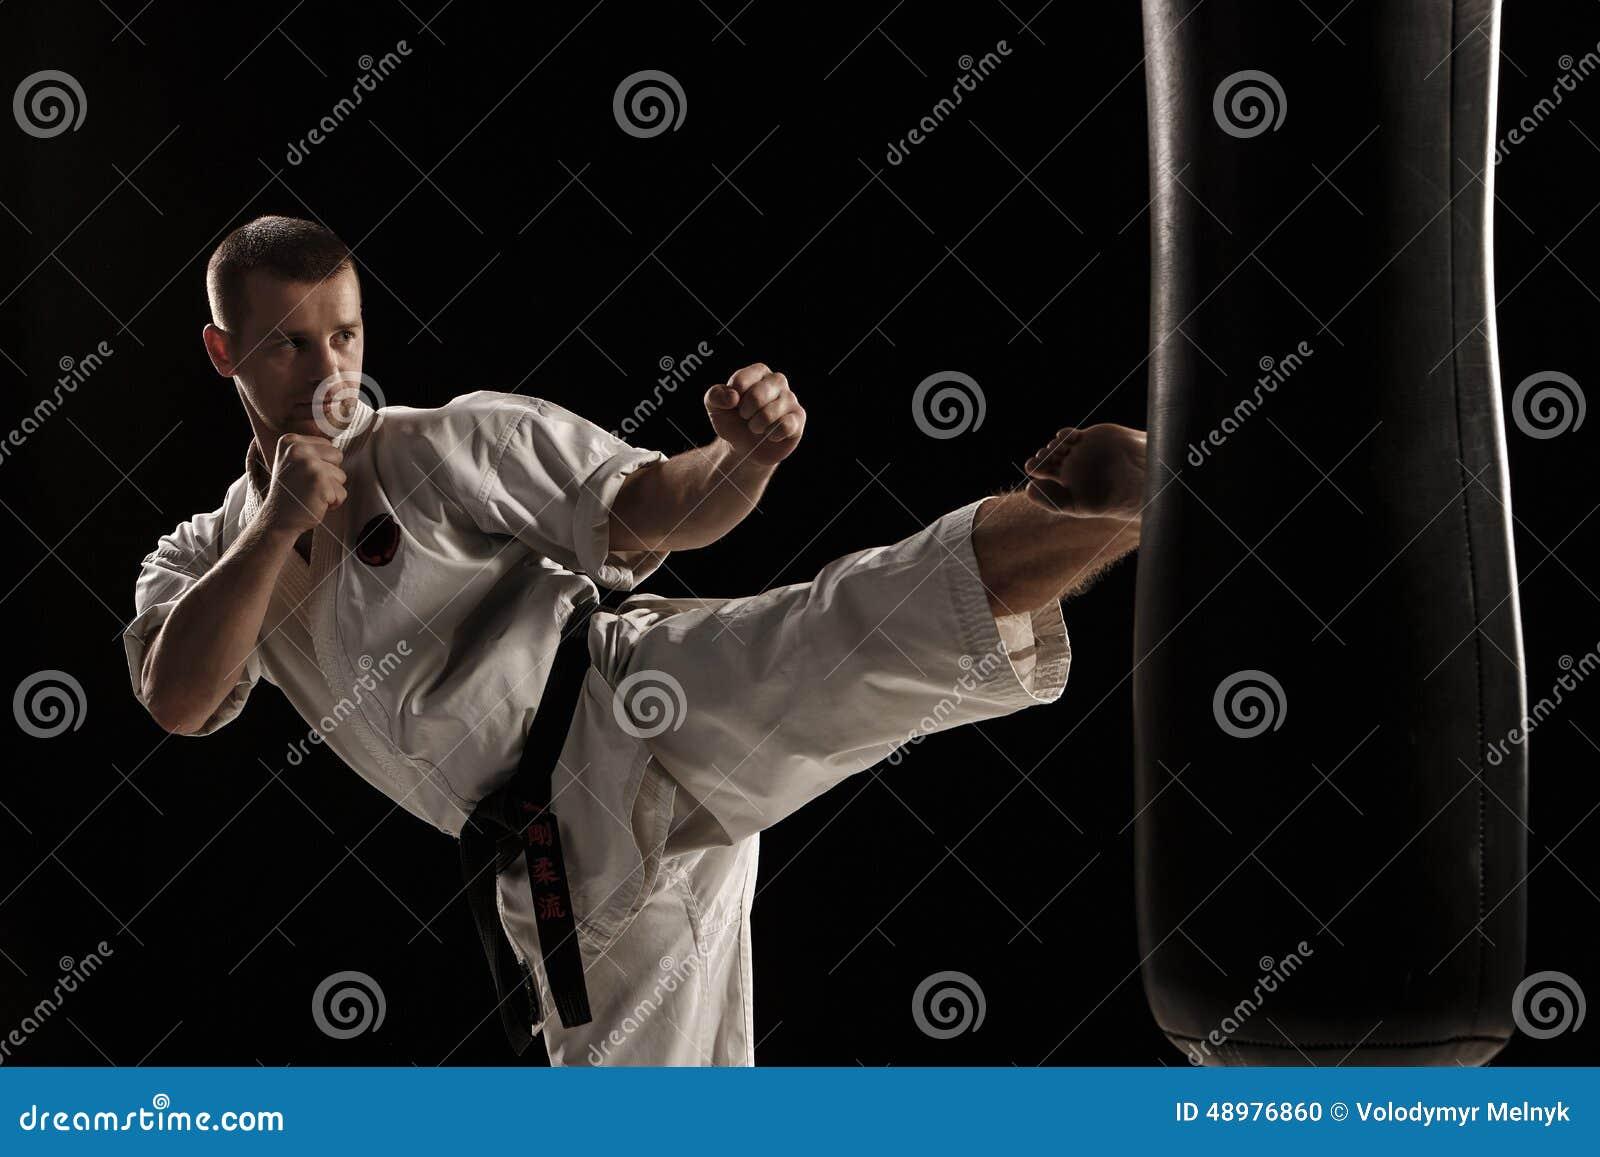 Karaterundan sparkar in en stansa påse